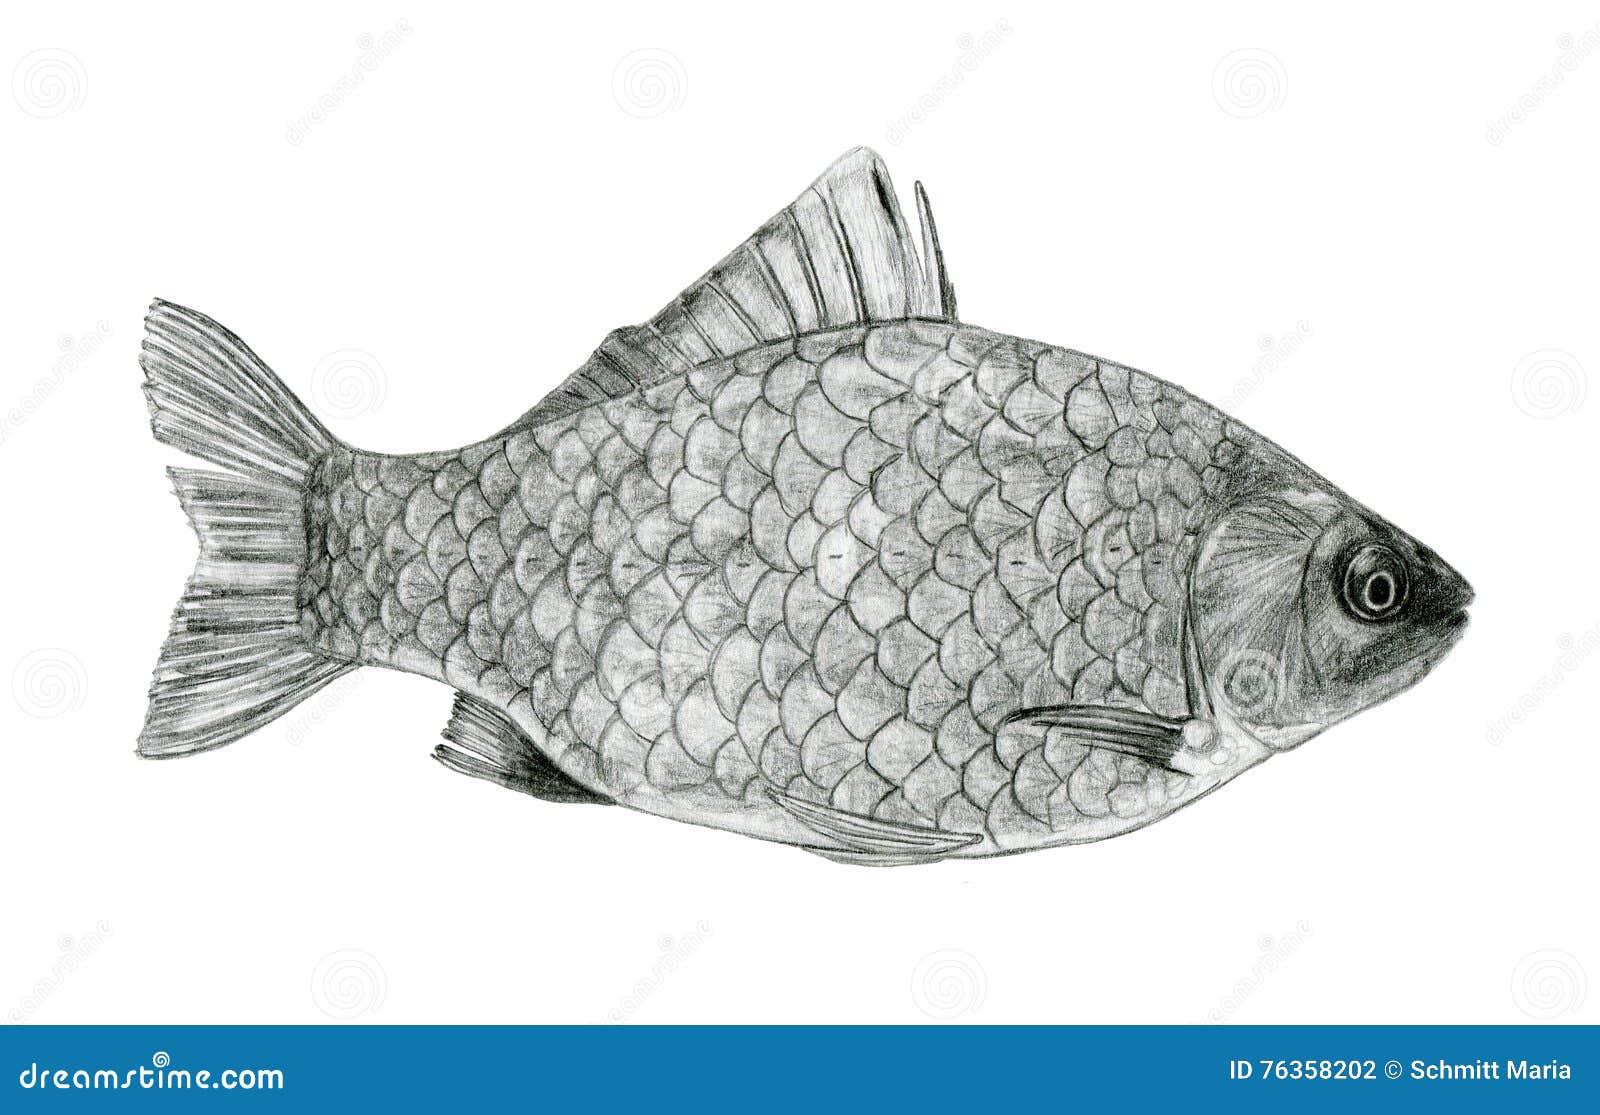 Dessin de croquis de bar de mer de poissons illustration - Croquis poisson ...